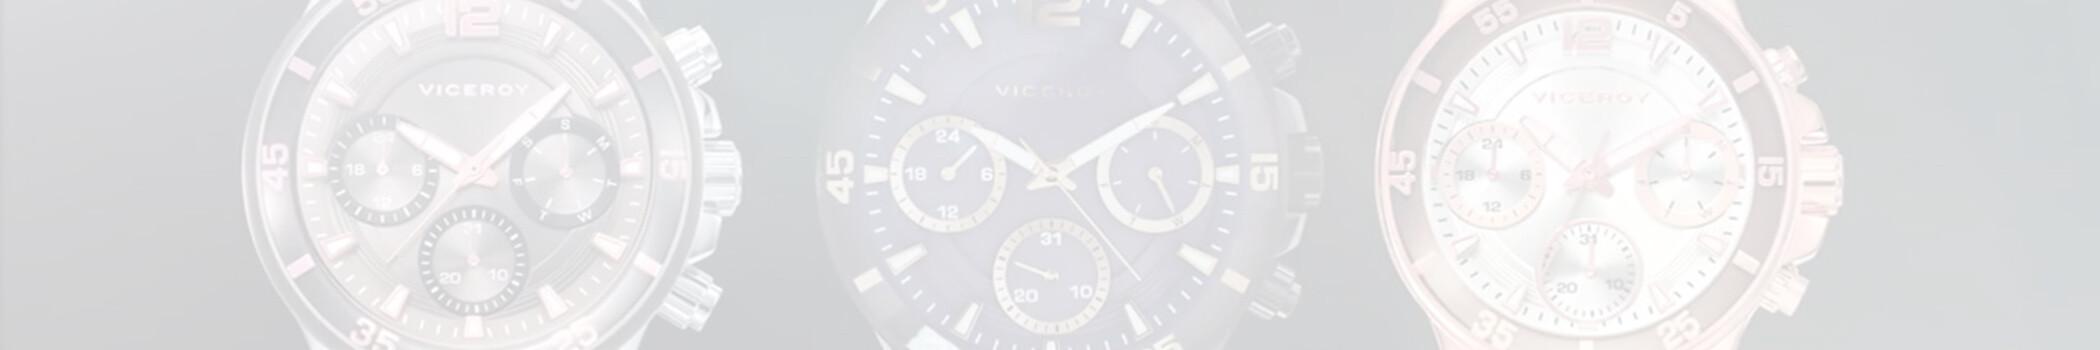 Relojes Viceroy - Carmena Joyeros